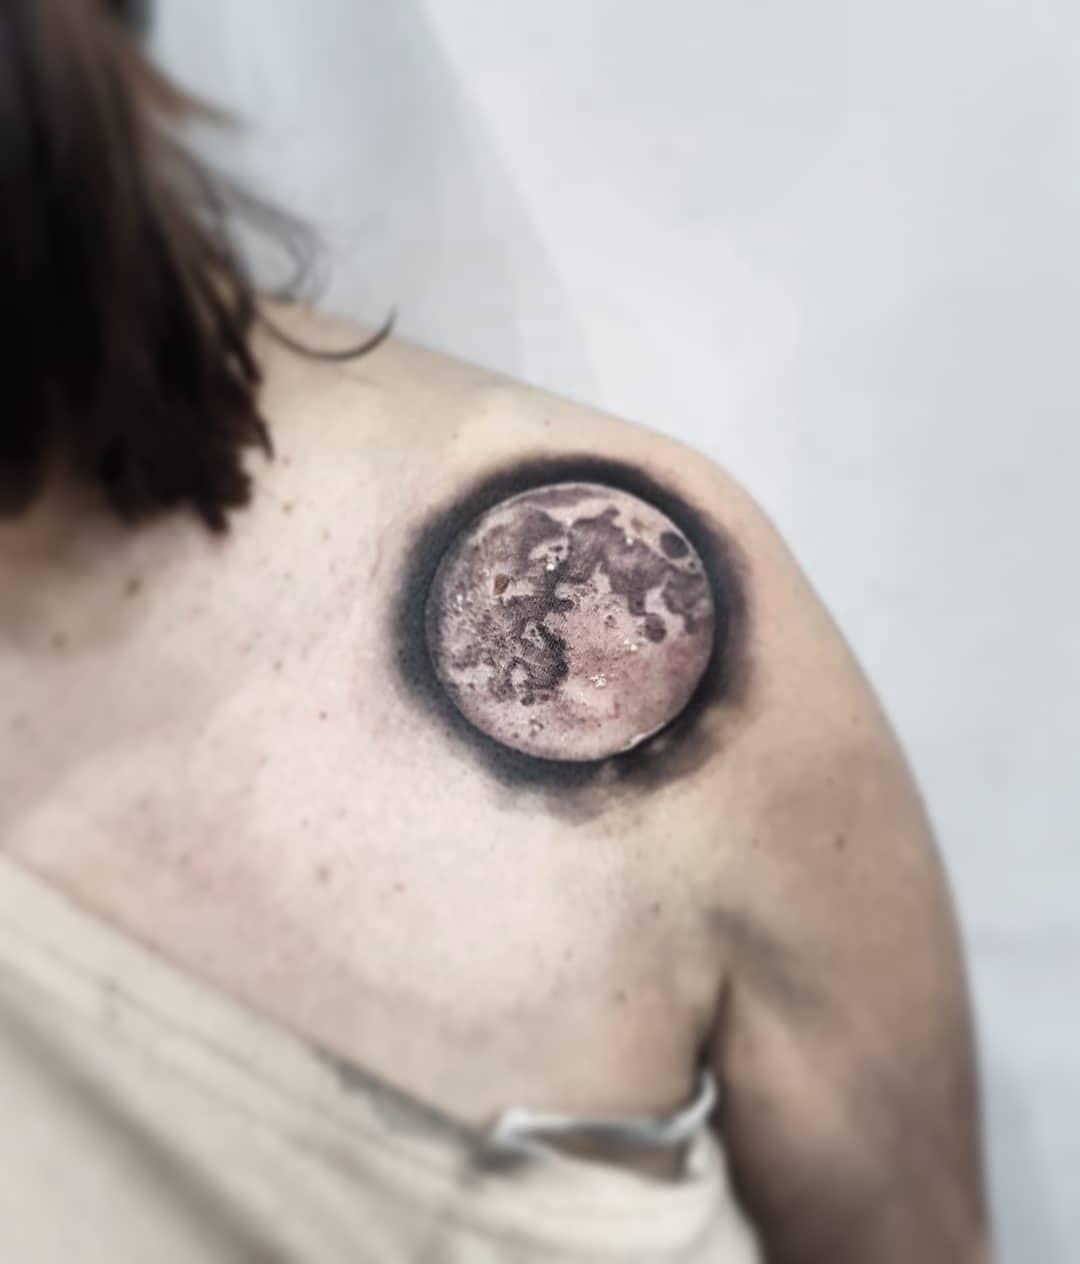 Little moon moon lunar tattoo edinburghtattooartist studioxiii tattooartist tattooartistuk edinburgh ink tattoos inked tattooed picoftheday art love pic photooftheday photo blackandgrey blackngrey instagram artist design tattooer